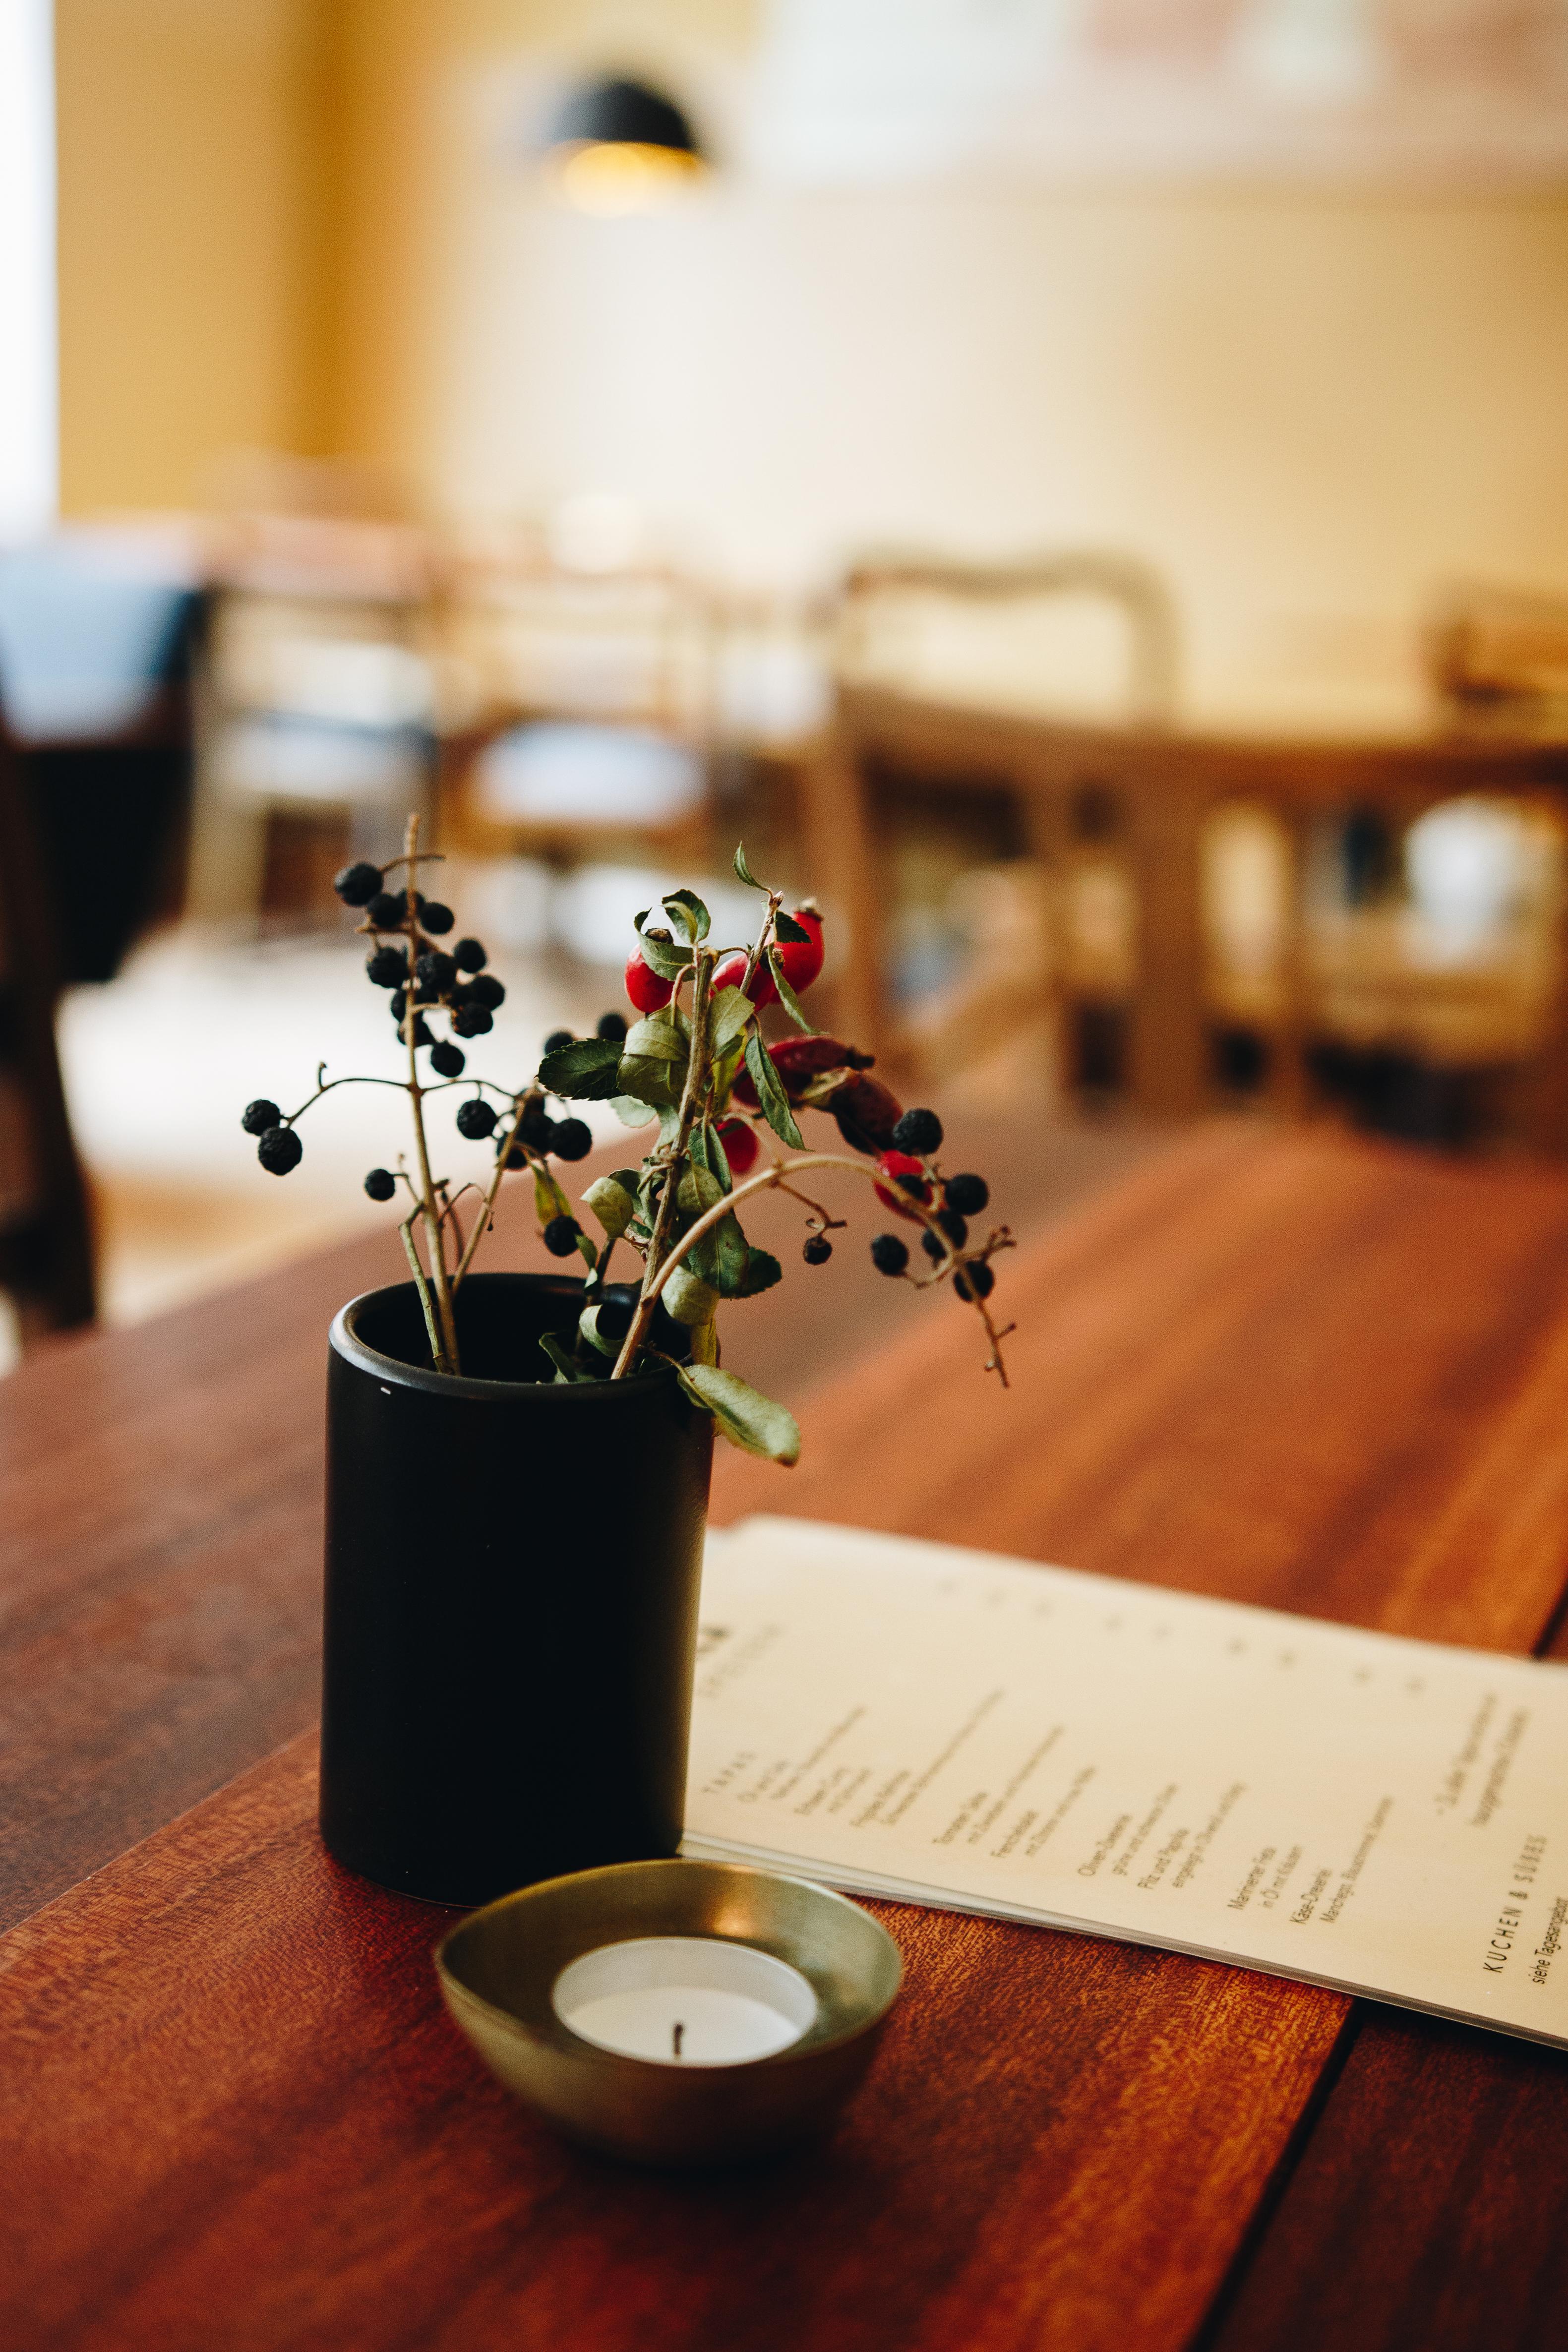 café ocka-lindenau-annabelle sagt-leipzig5